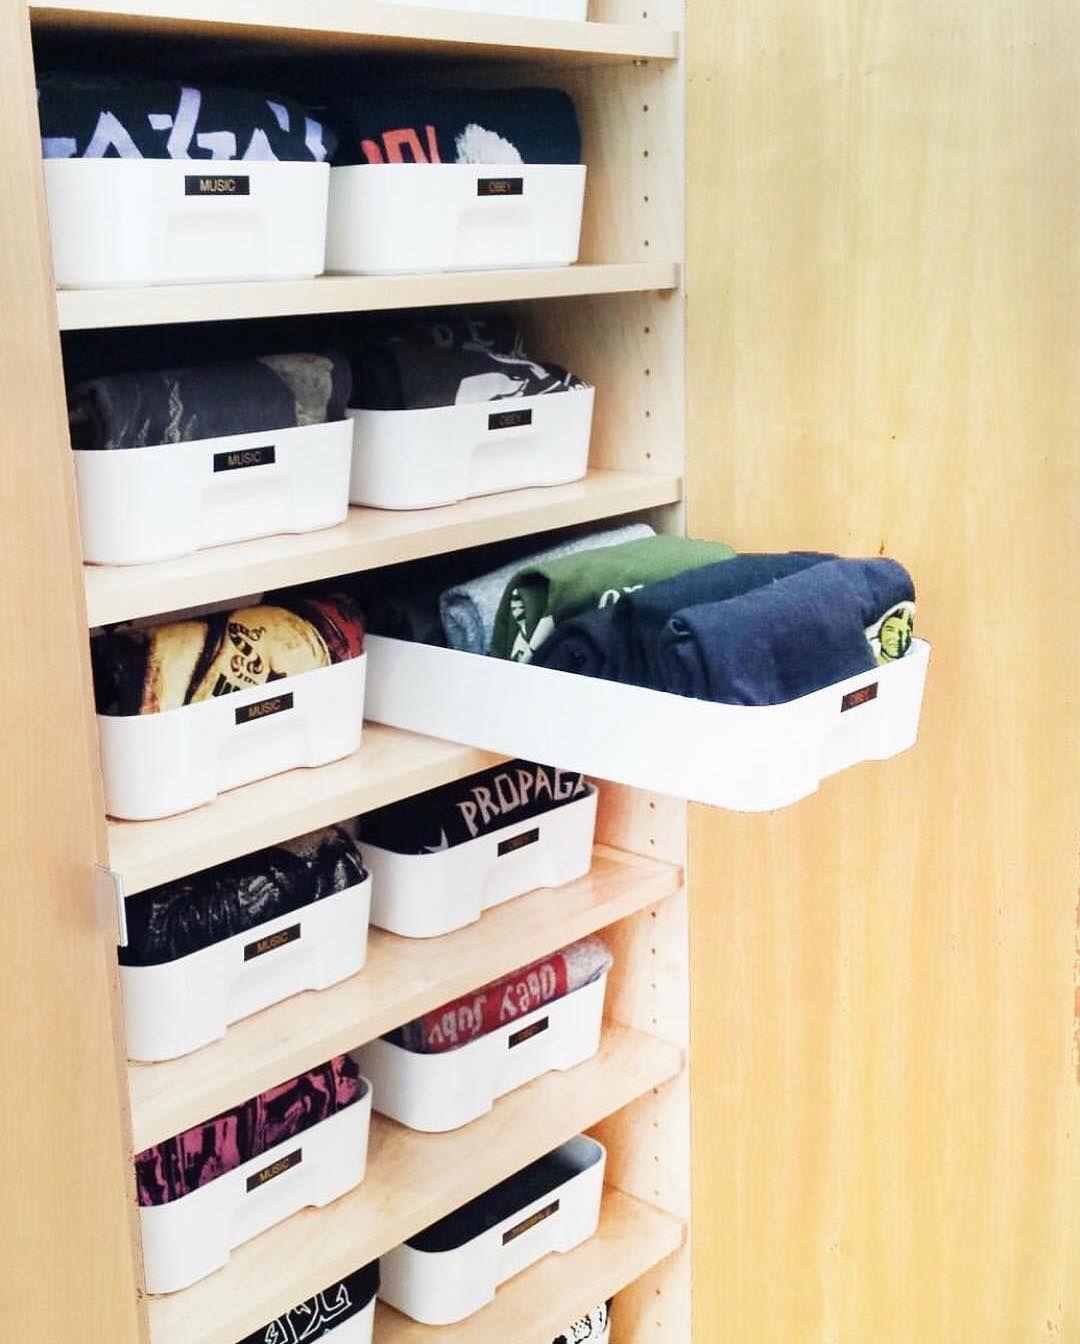 Marie Kondo Trained Konmari On Instagram Day 21 Konmari Clothes Shelves Joy Closet Clothes Storage Storage Closet Organization Ikea Organization